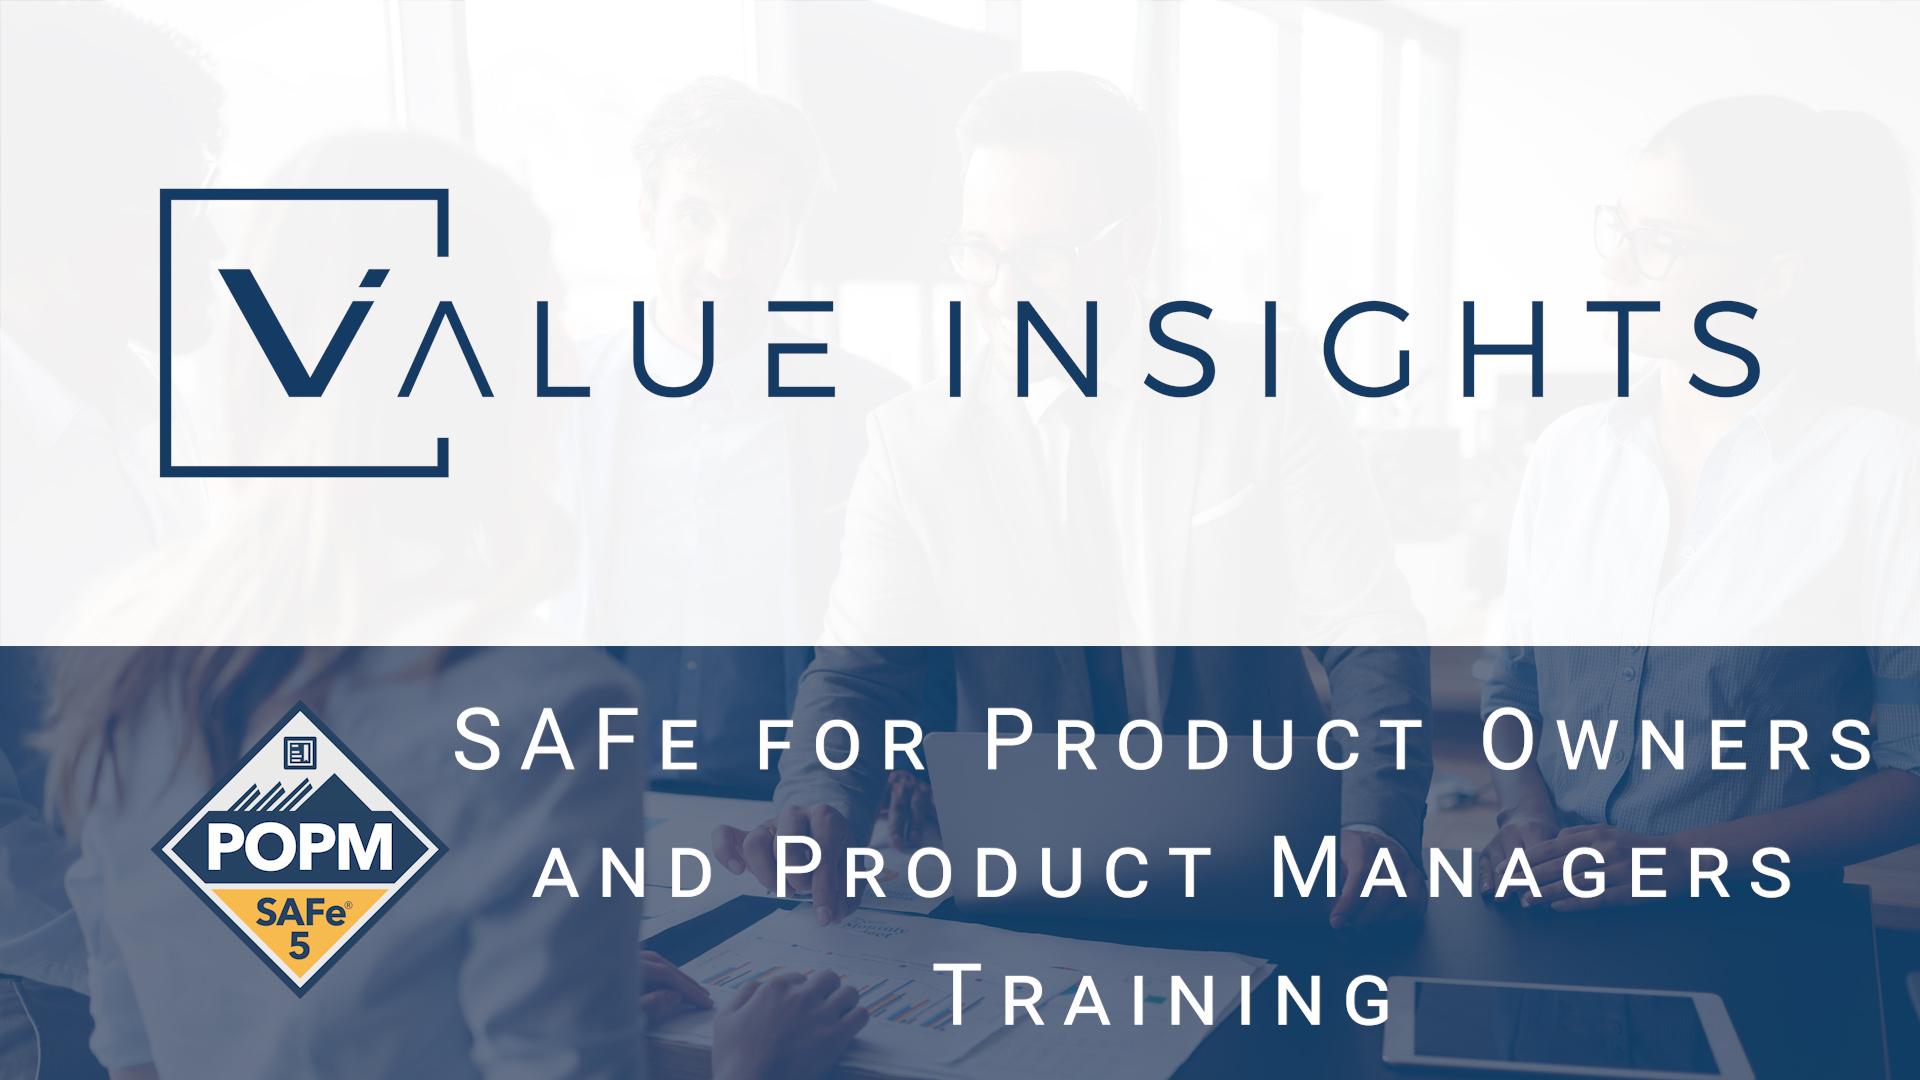 safe for POs/PMs product owners managersPOPM badge transparent logo png